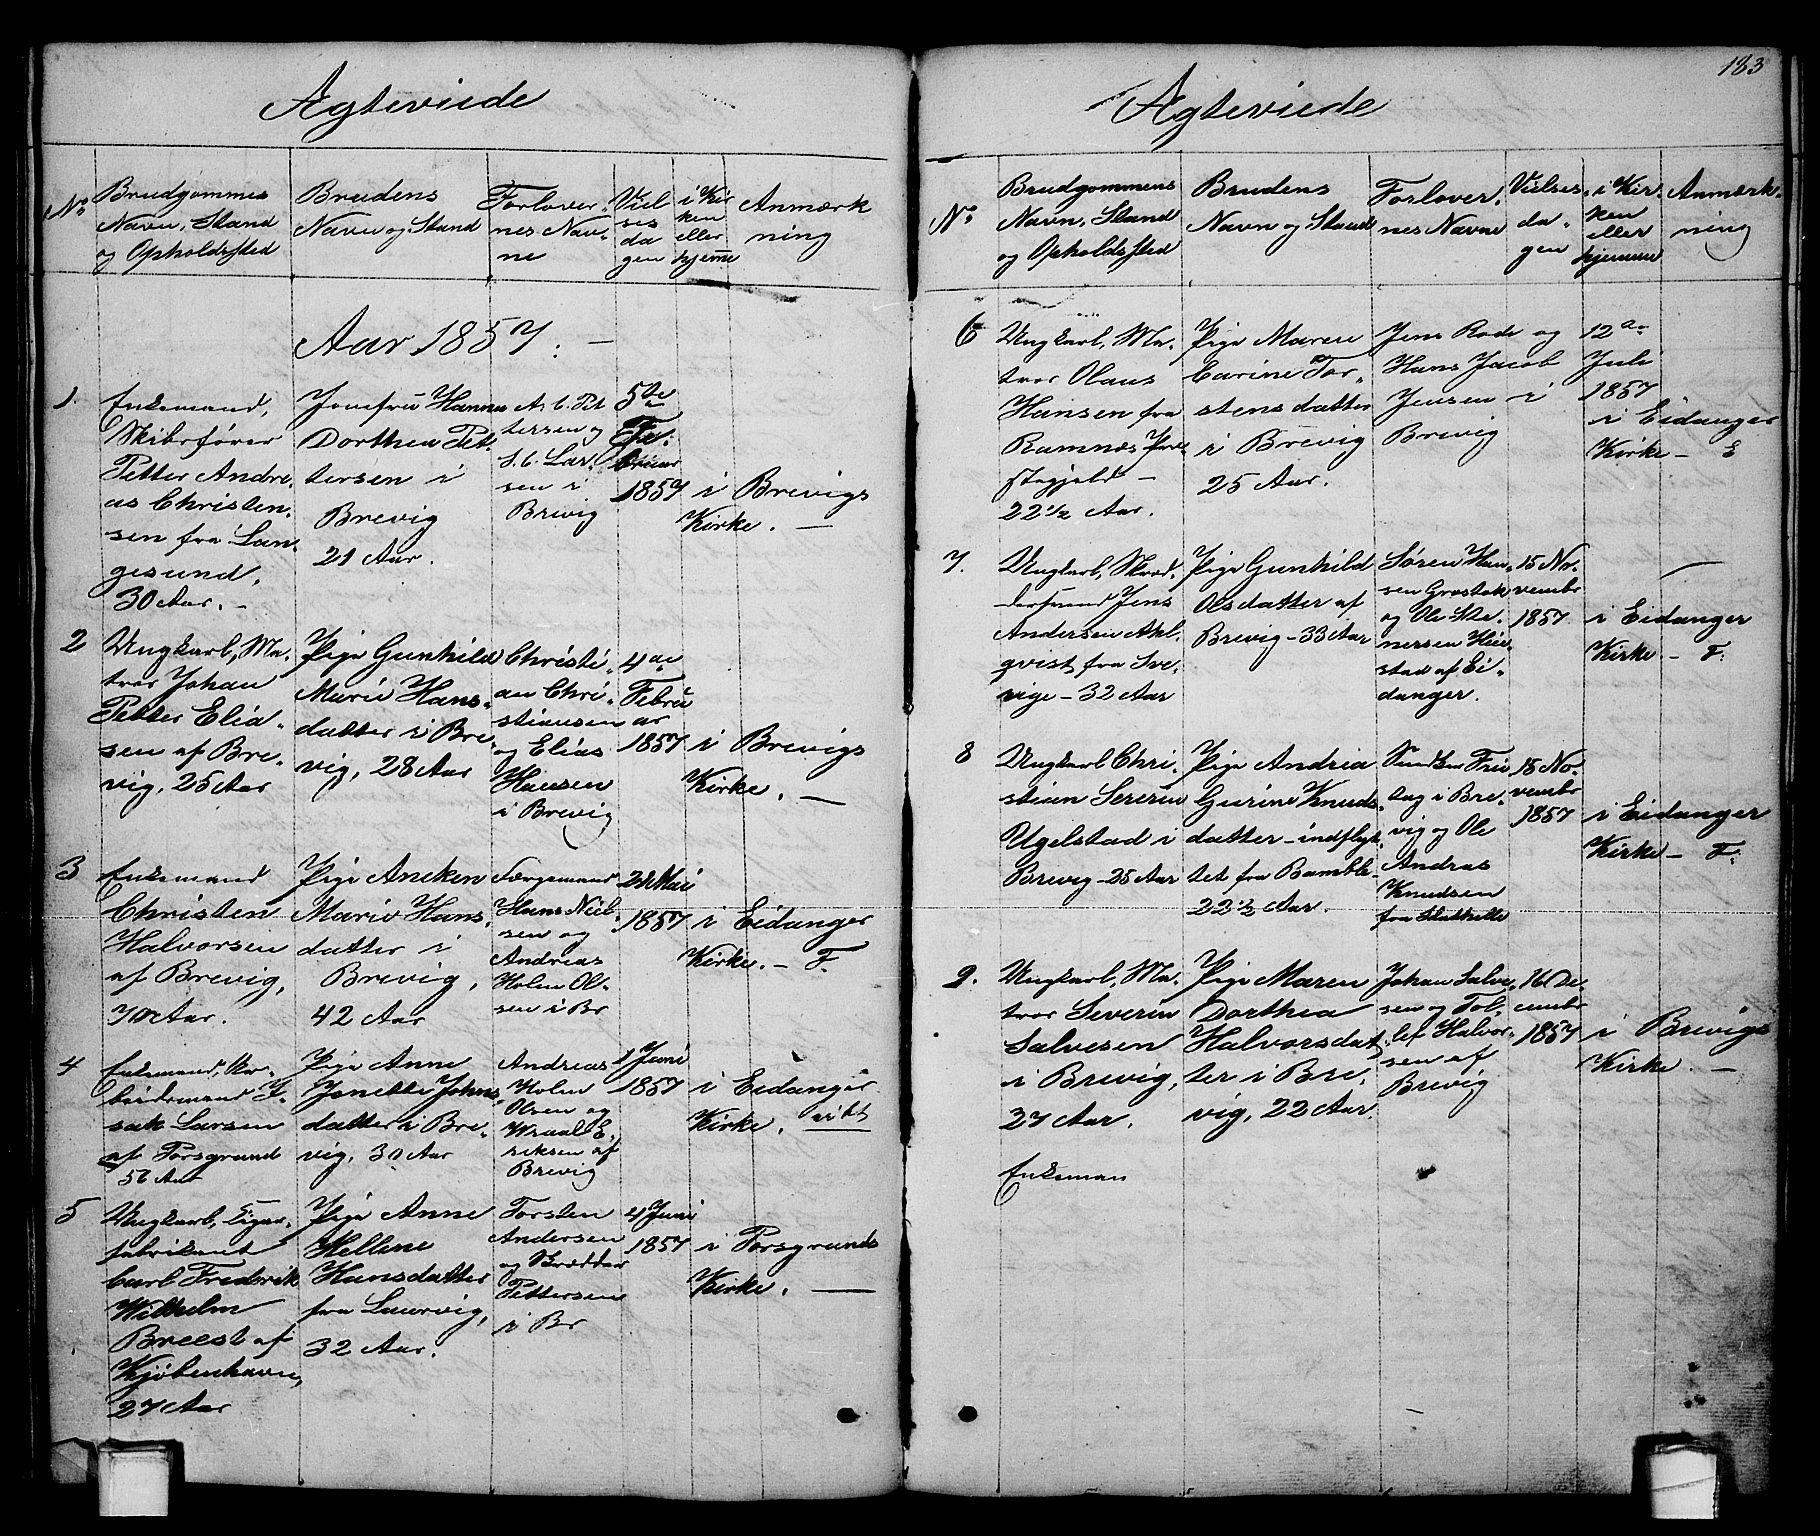 SAKO, Brevik kirkebøker, G/Ga/L0002: Klokkerbok nr. 2, 1846-1865, s. 183